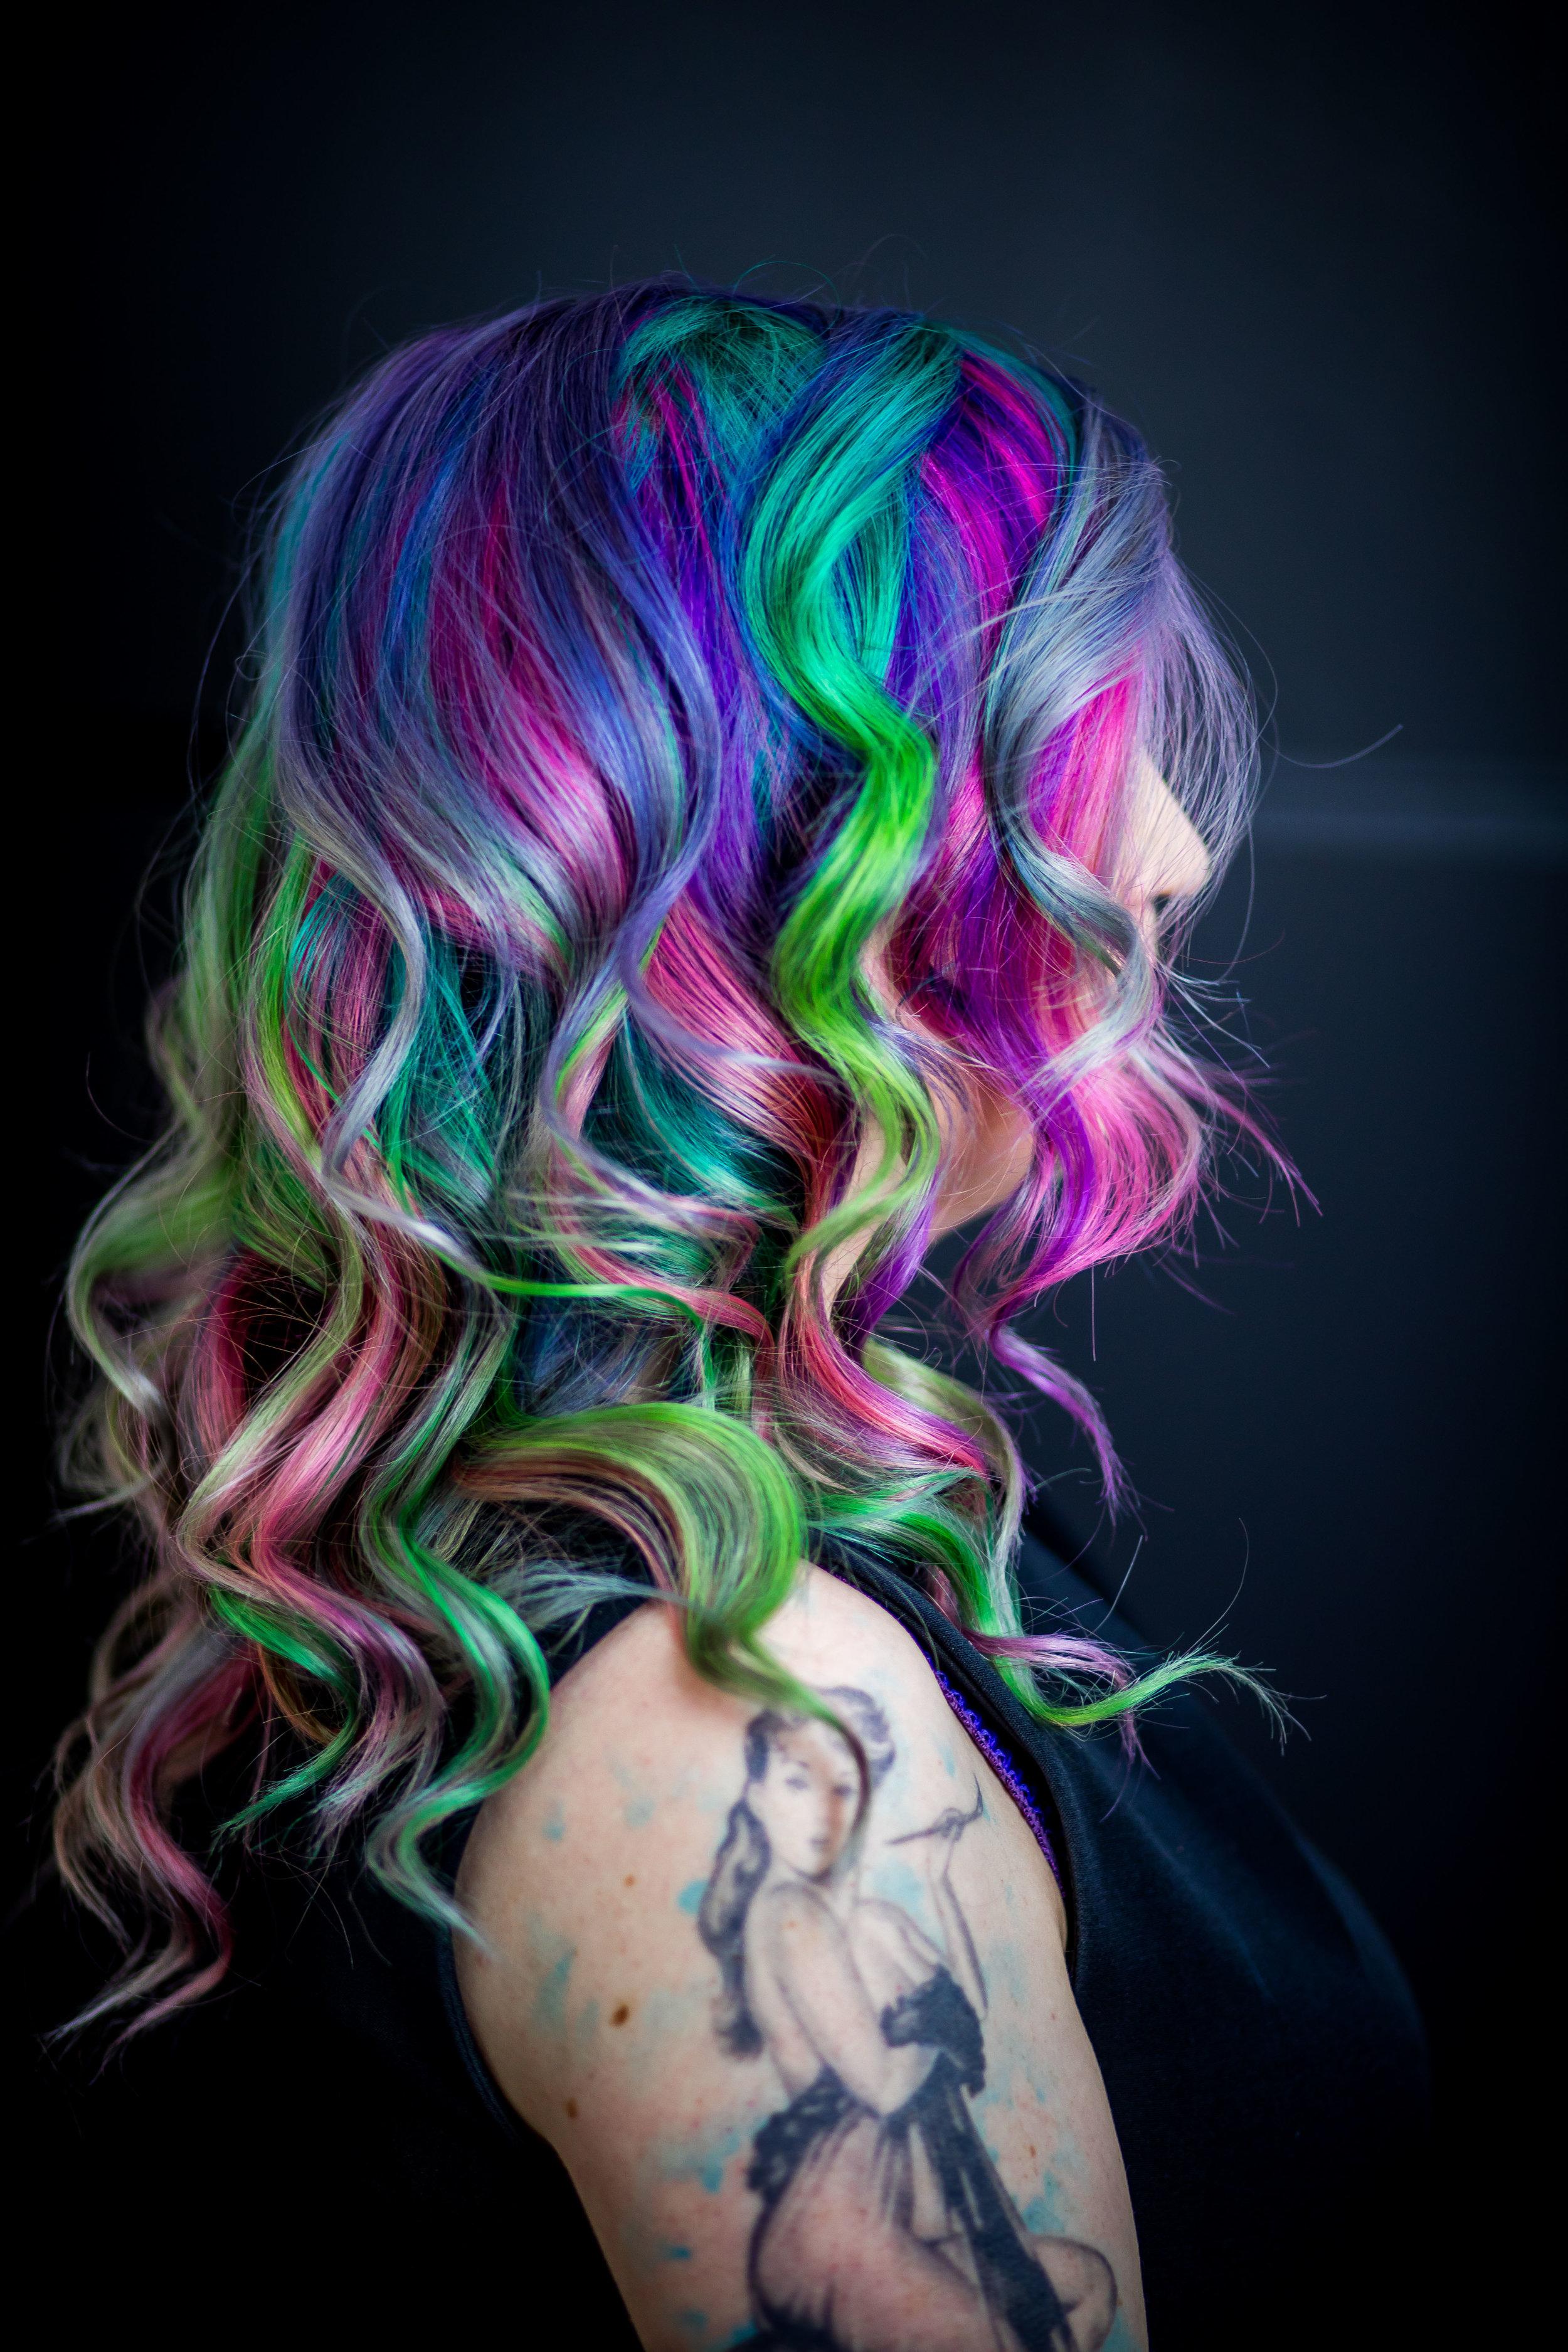 hair.color.art 2018-8070.jpg